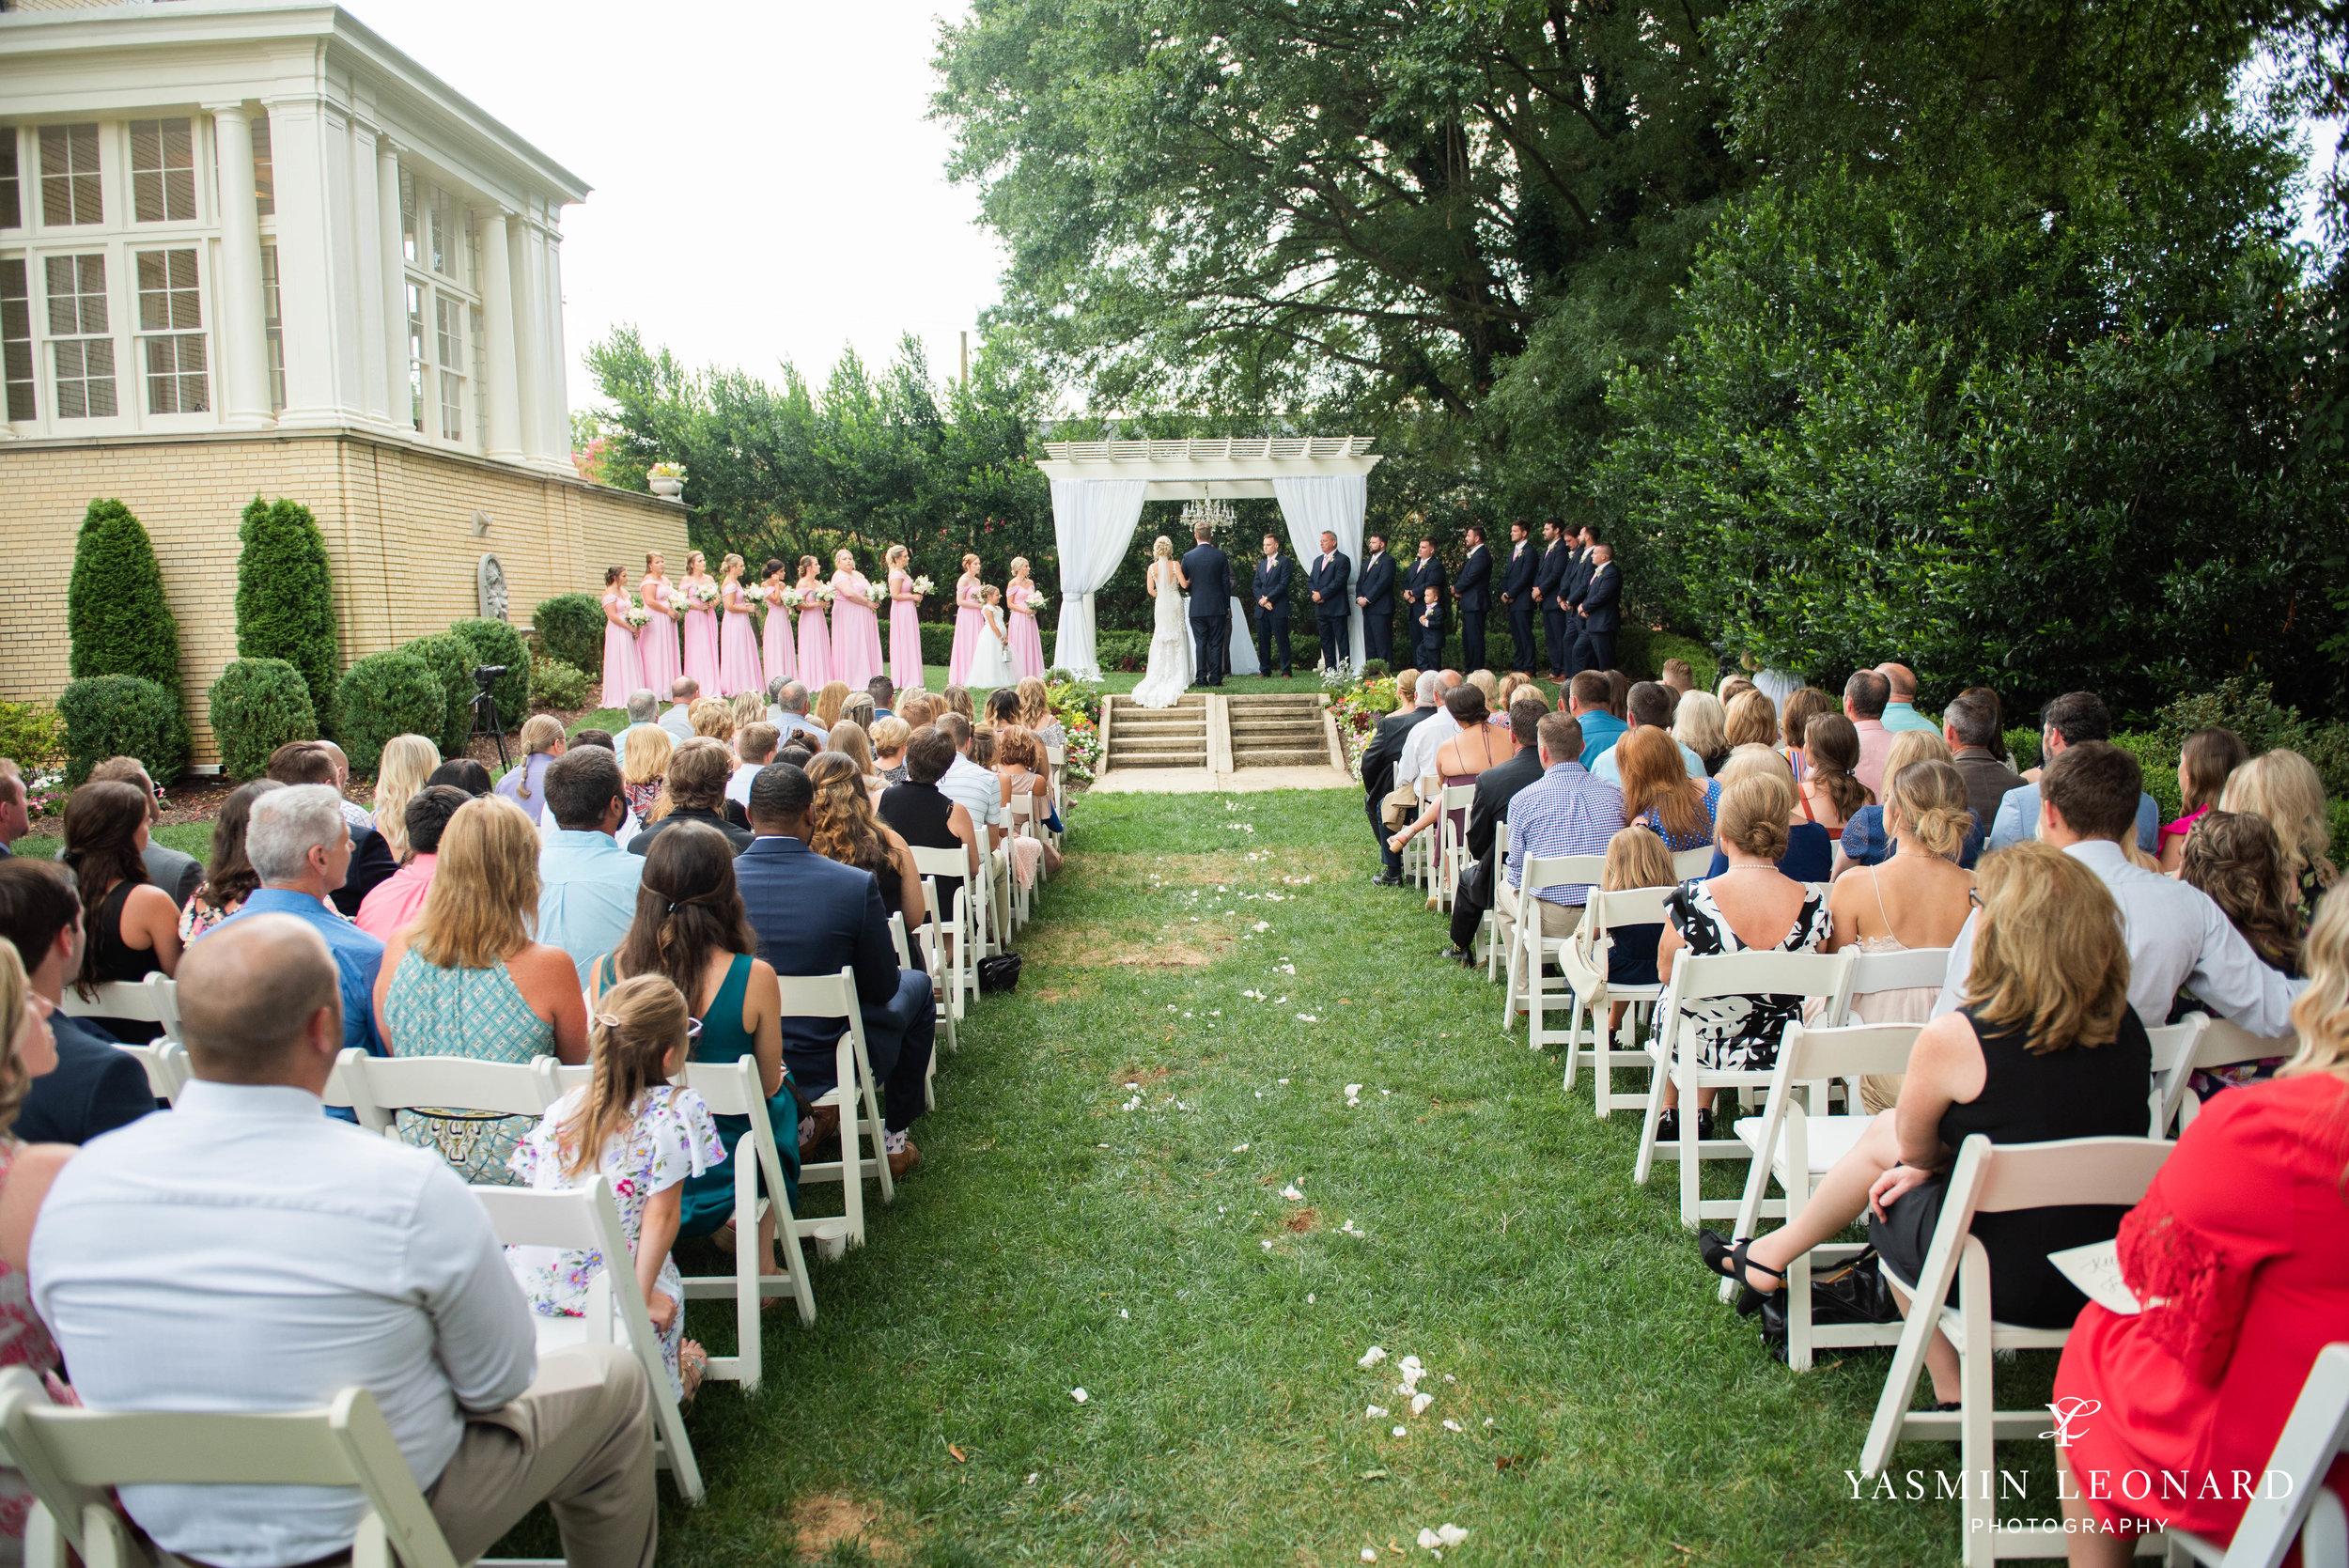 Separk Mansion - NC Weddings - Gastonia Wedding - NC Wedding Venues - Pink and Blue Wedding Ideas - Pink Bridesmaid Dresses - Yasmin Leonard Photography-21.jpg